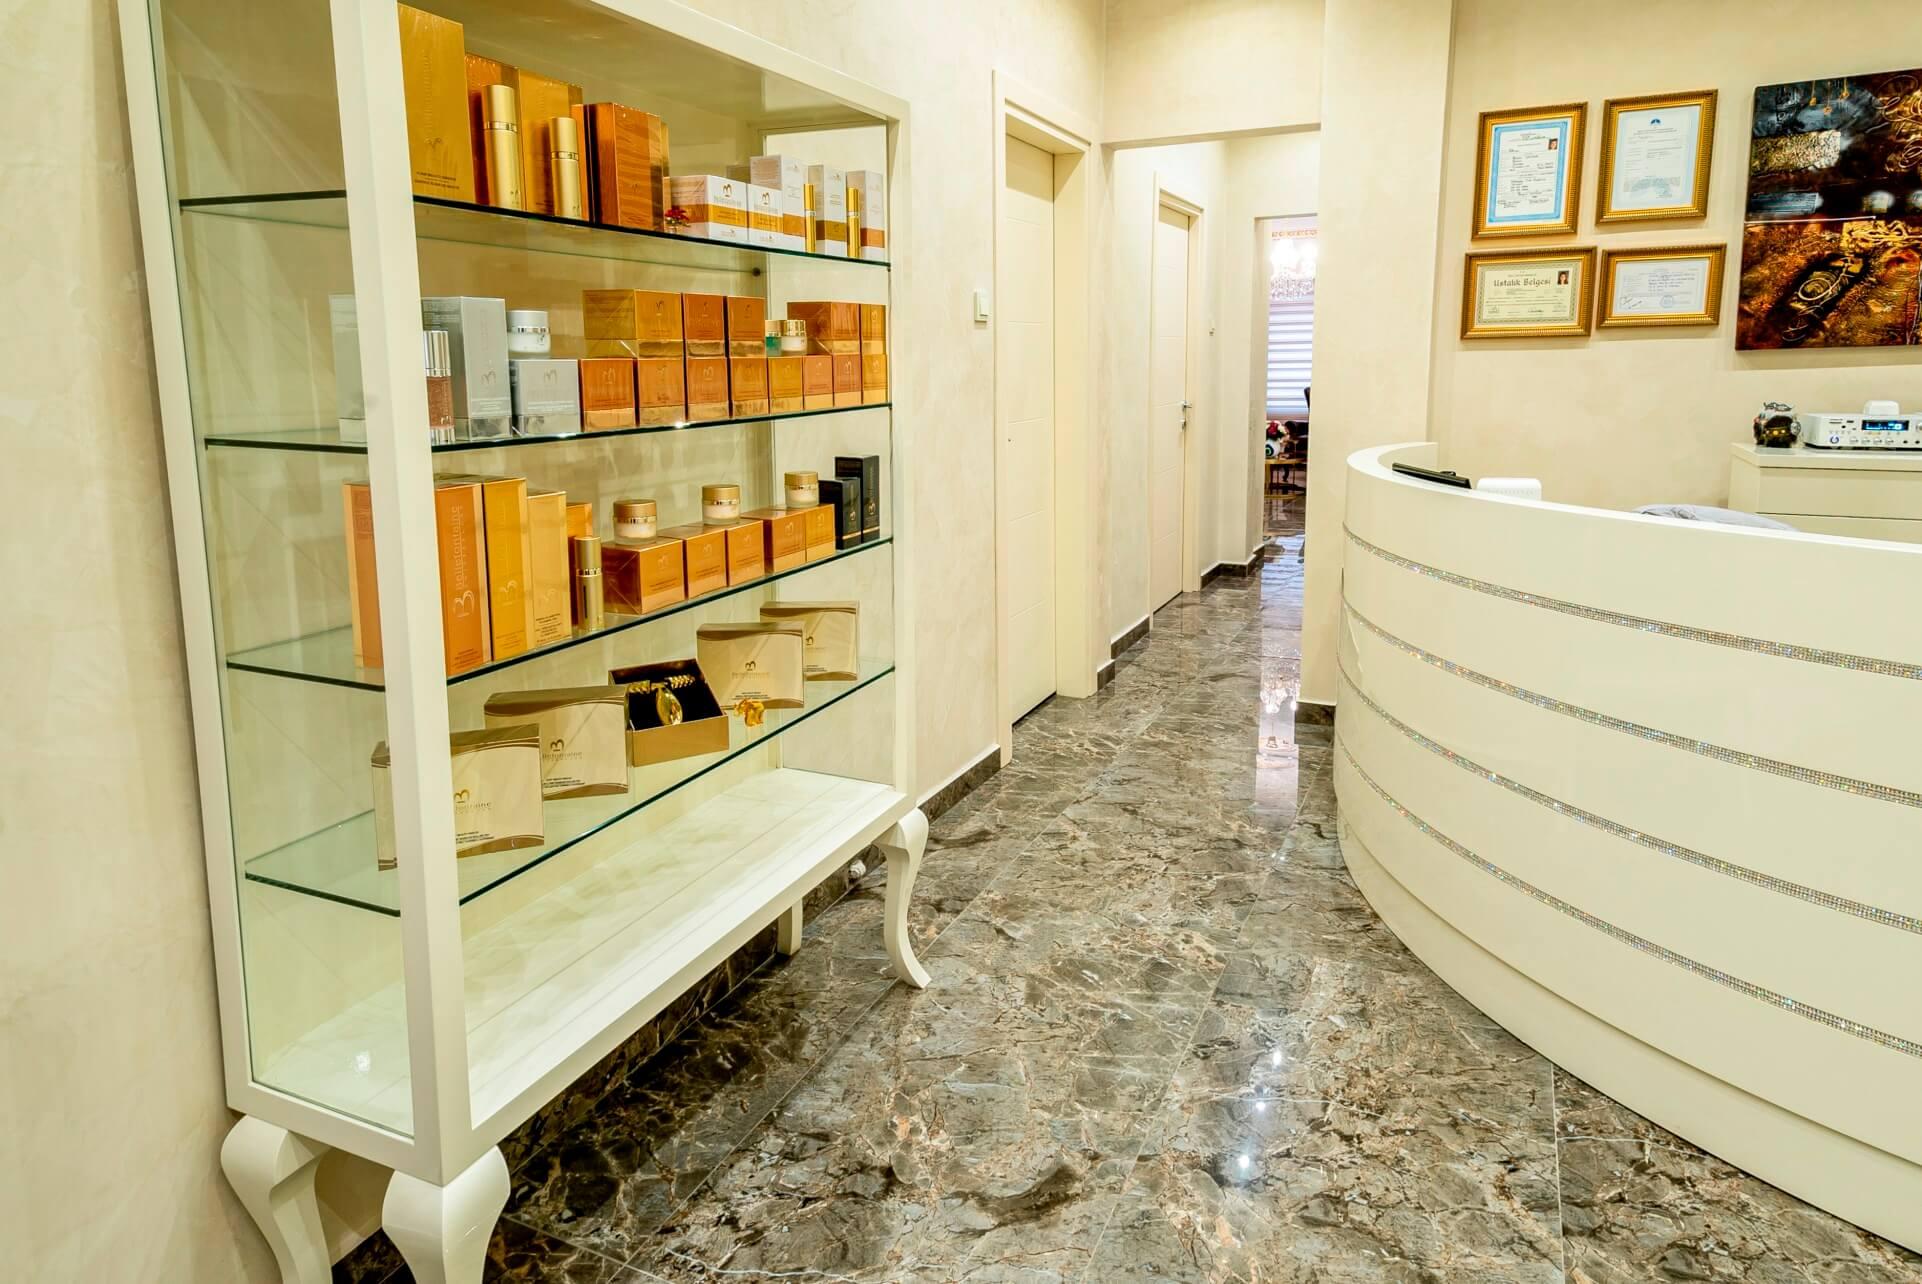 Elixir beauty institute